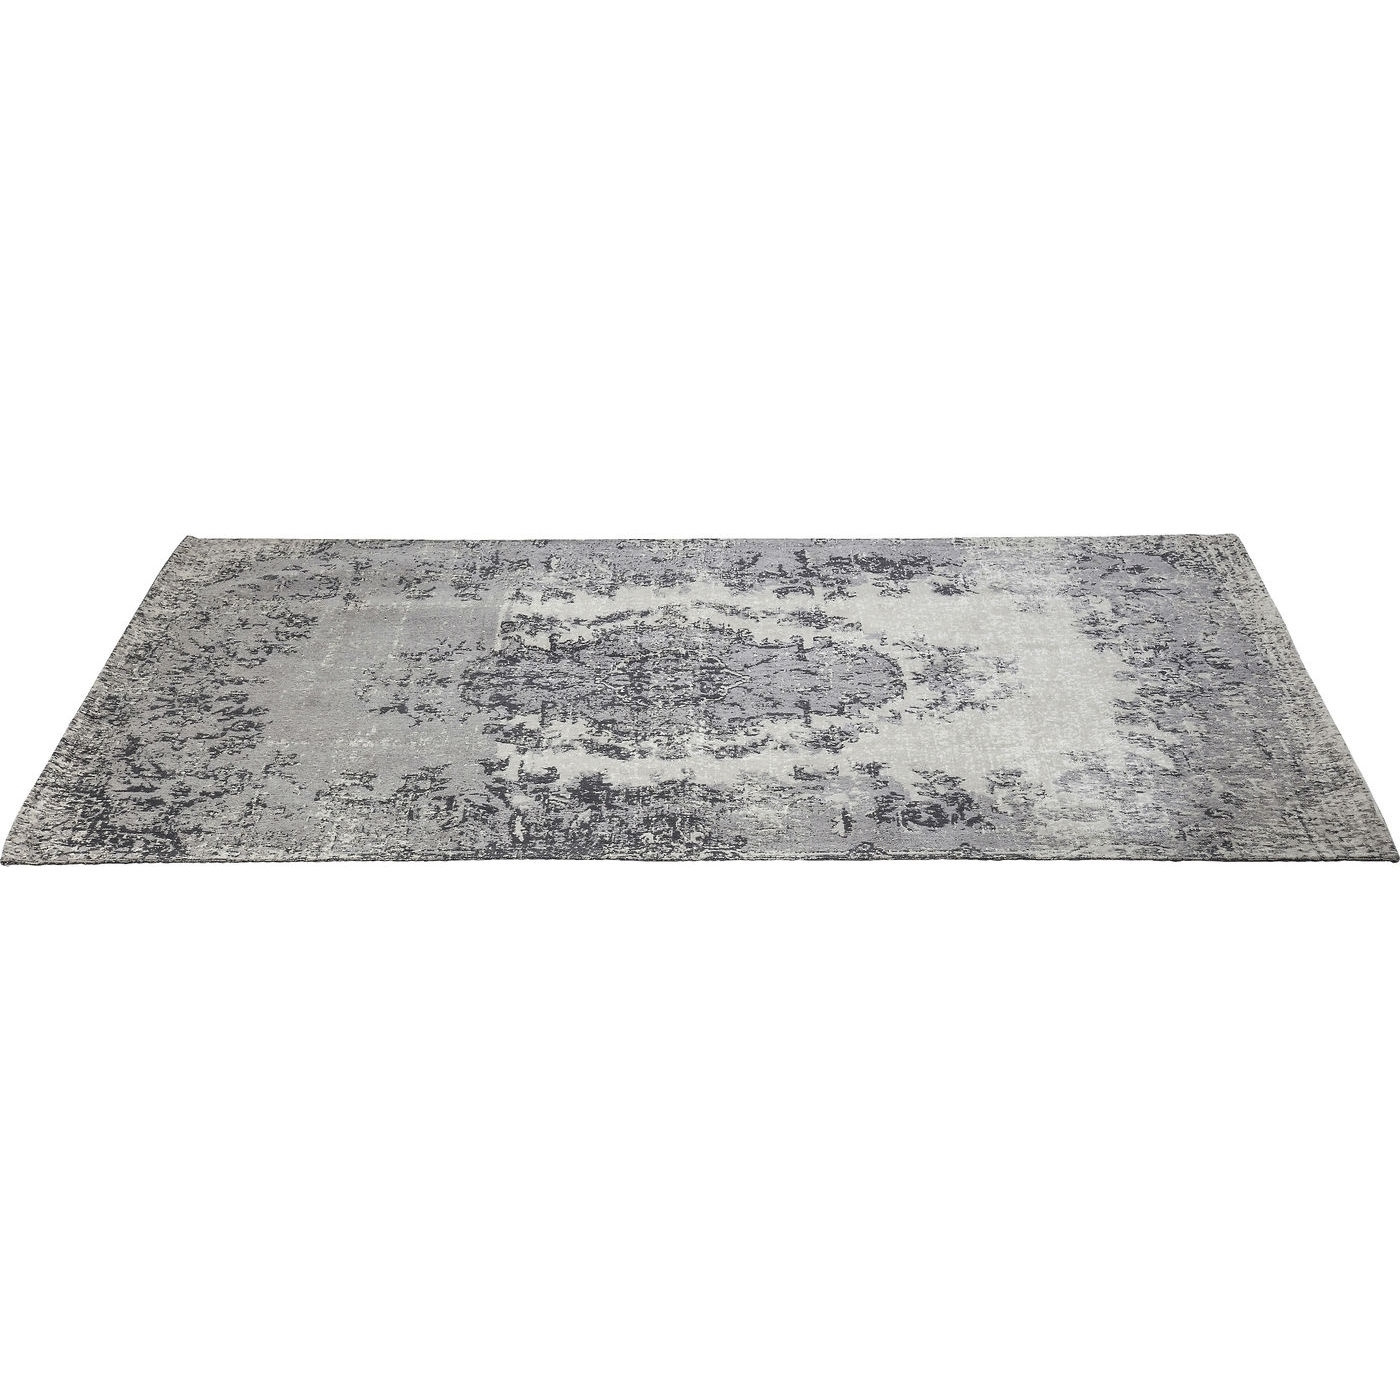 Teppich Kelim Pop grau 240x170cm